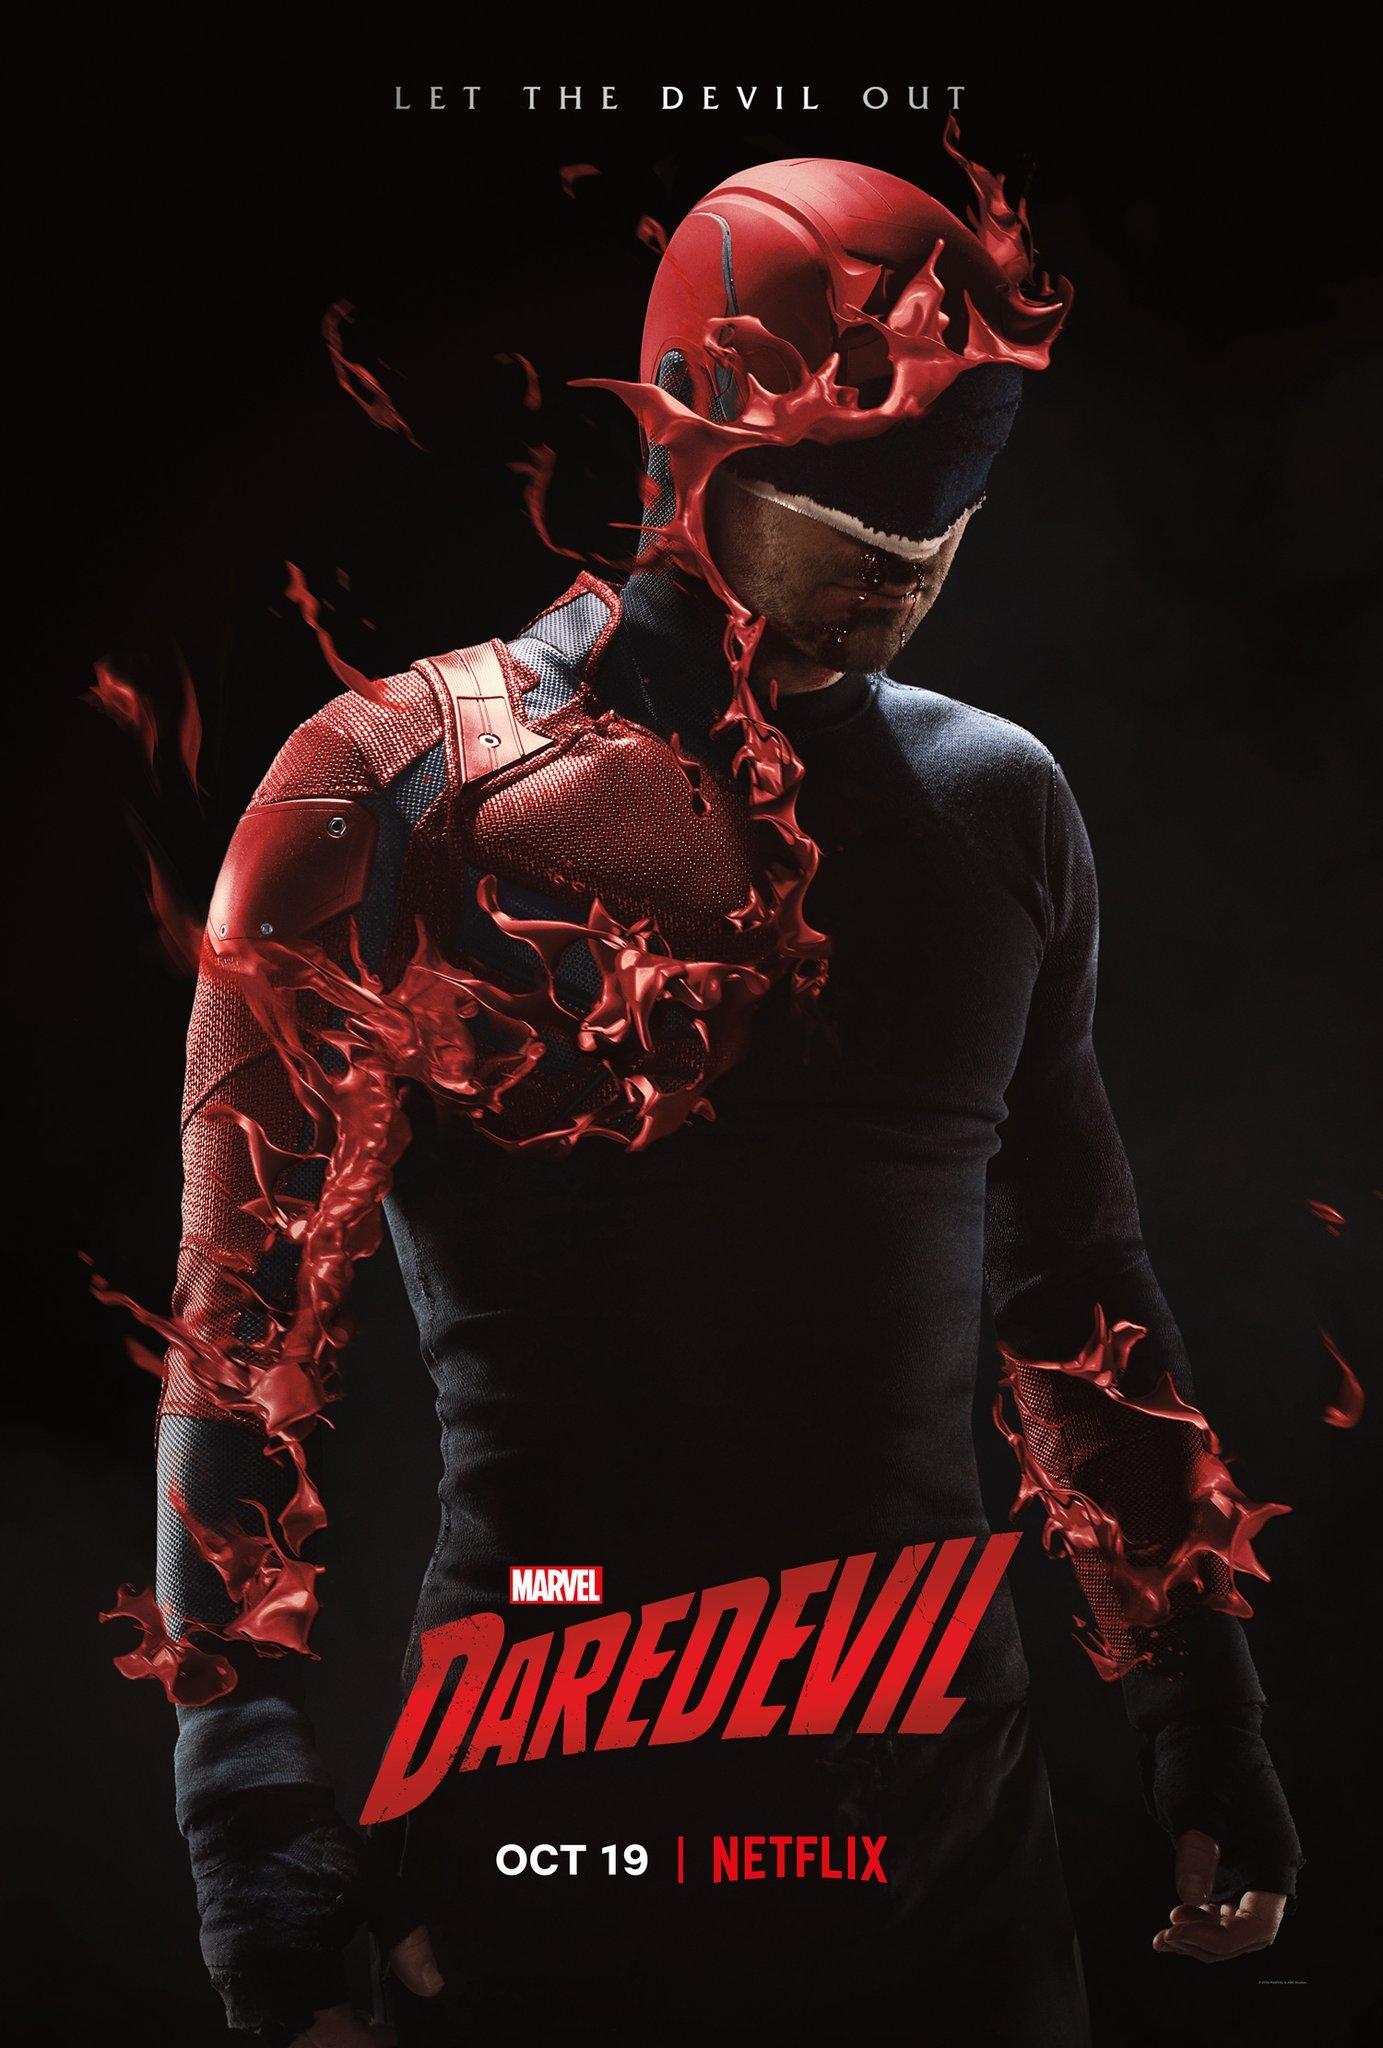 Will Marvel bring back Daredevil with season 4?